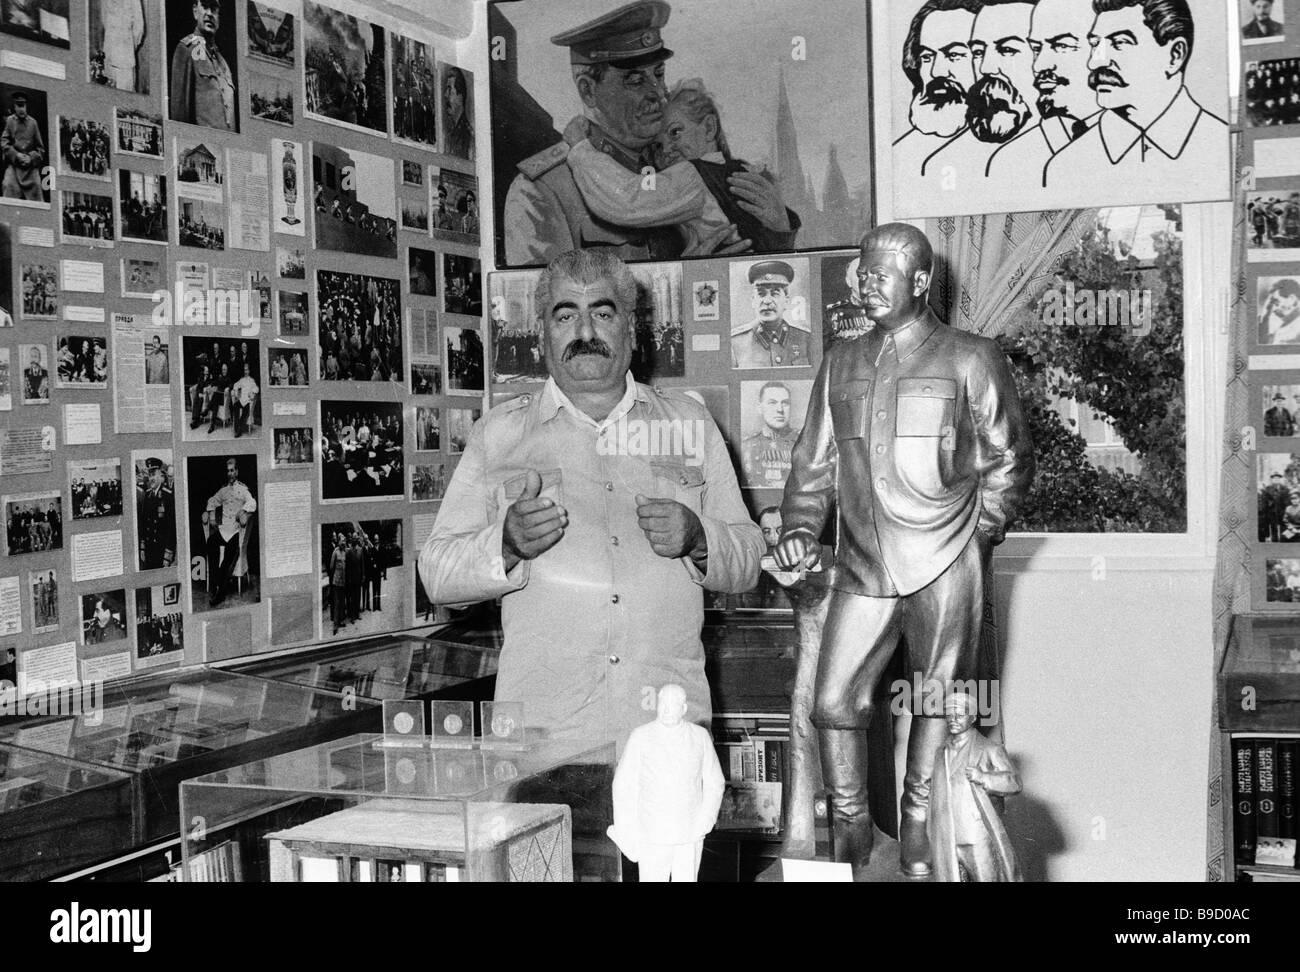 Docker Guram Kakhidze of the Batumi port among exhibits of his Stalin cult of personality museum Stock Photo